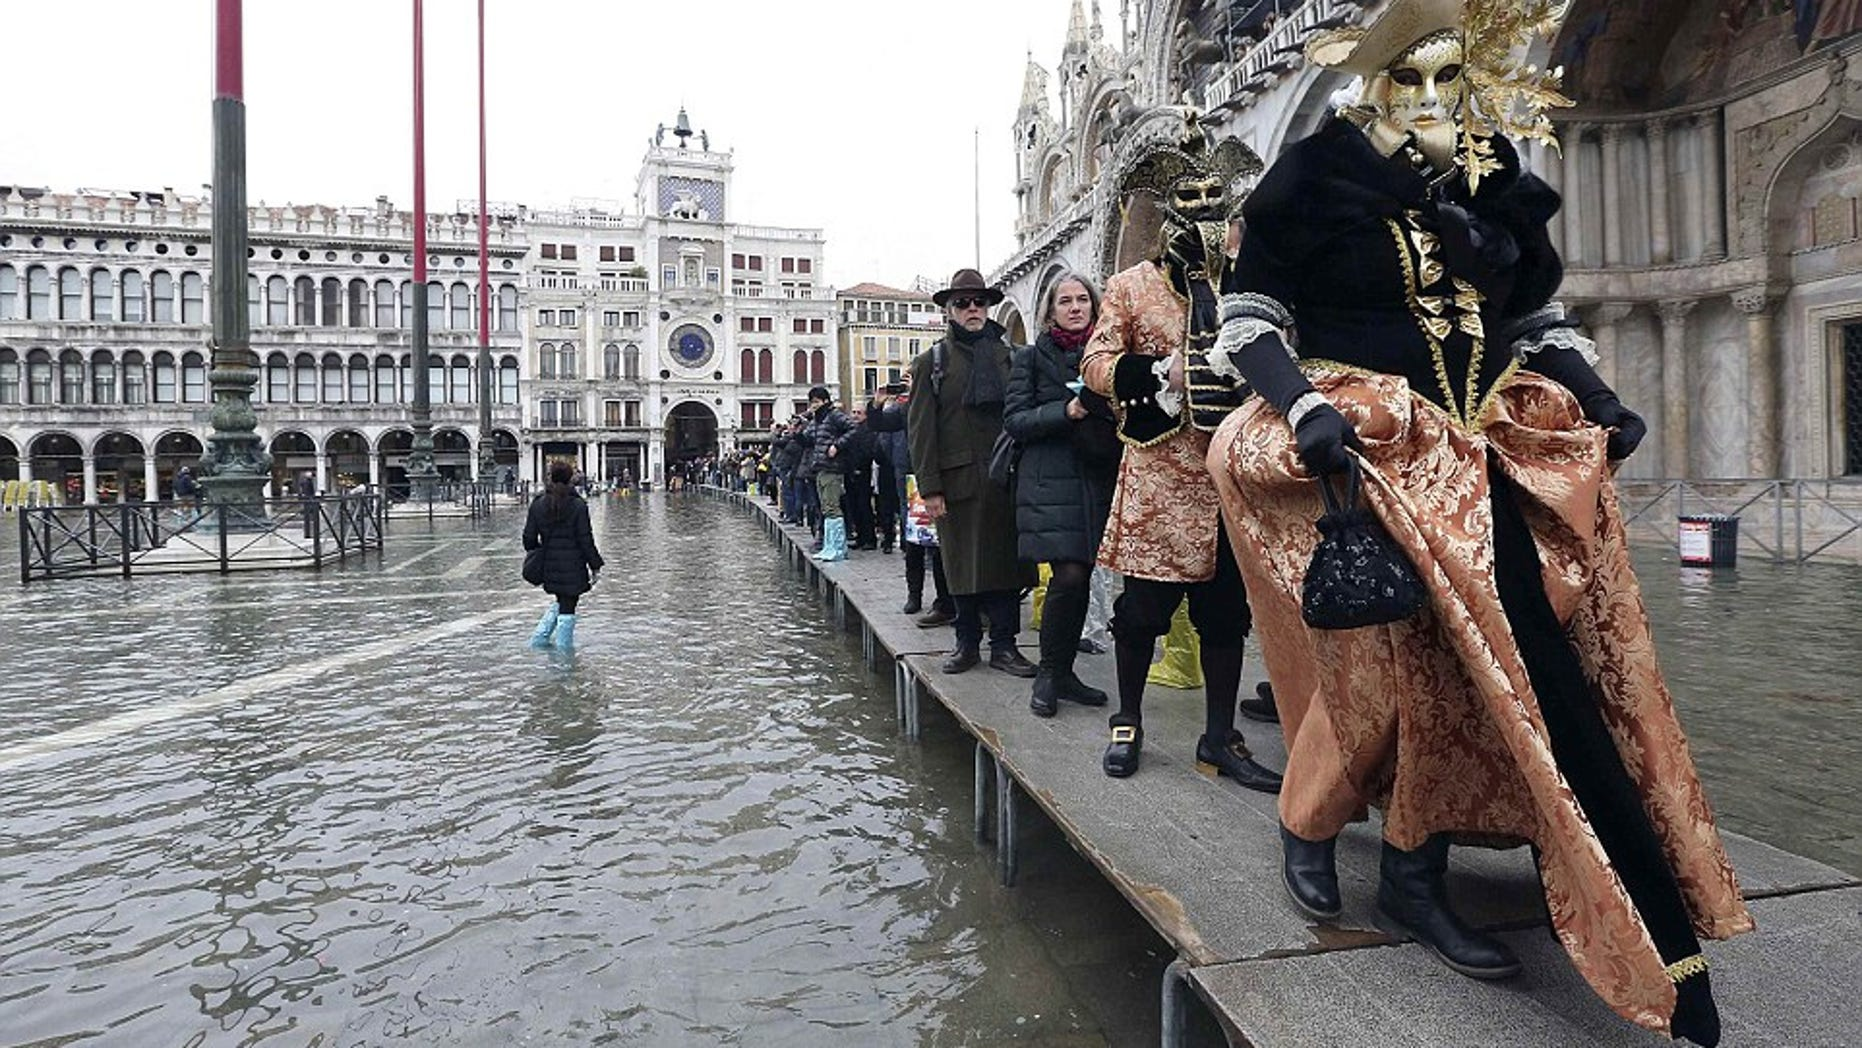 Tourists navigate Venice's city center on narrow wooden platforms.